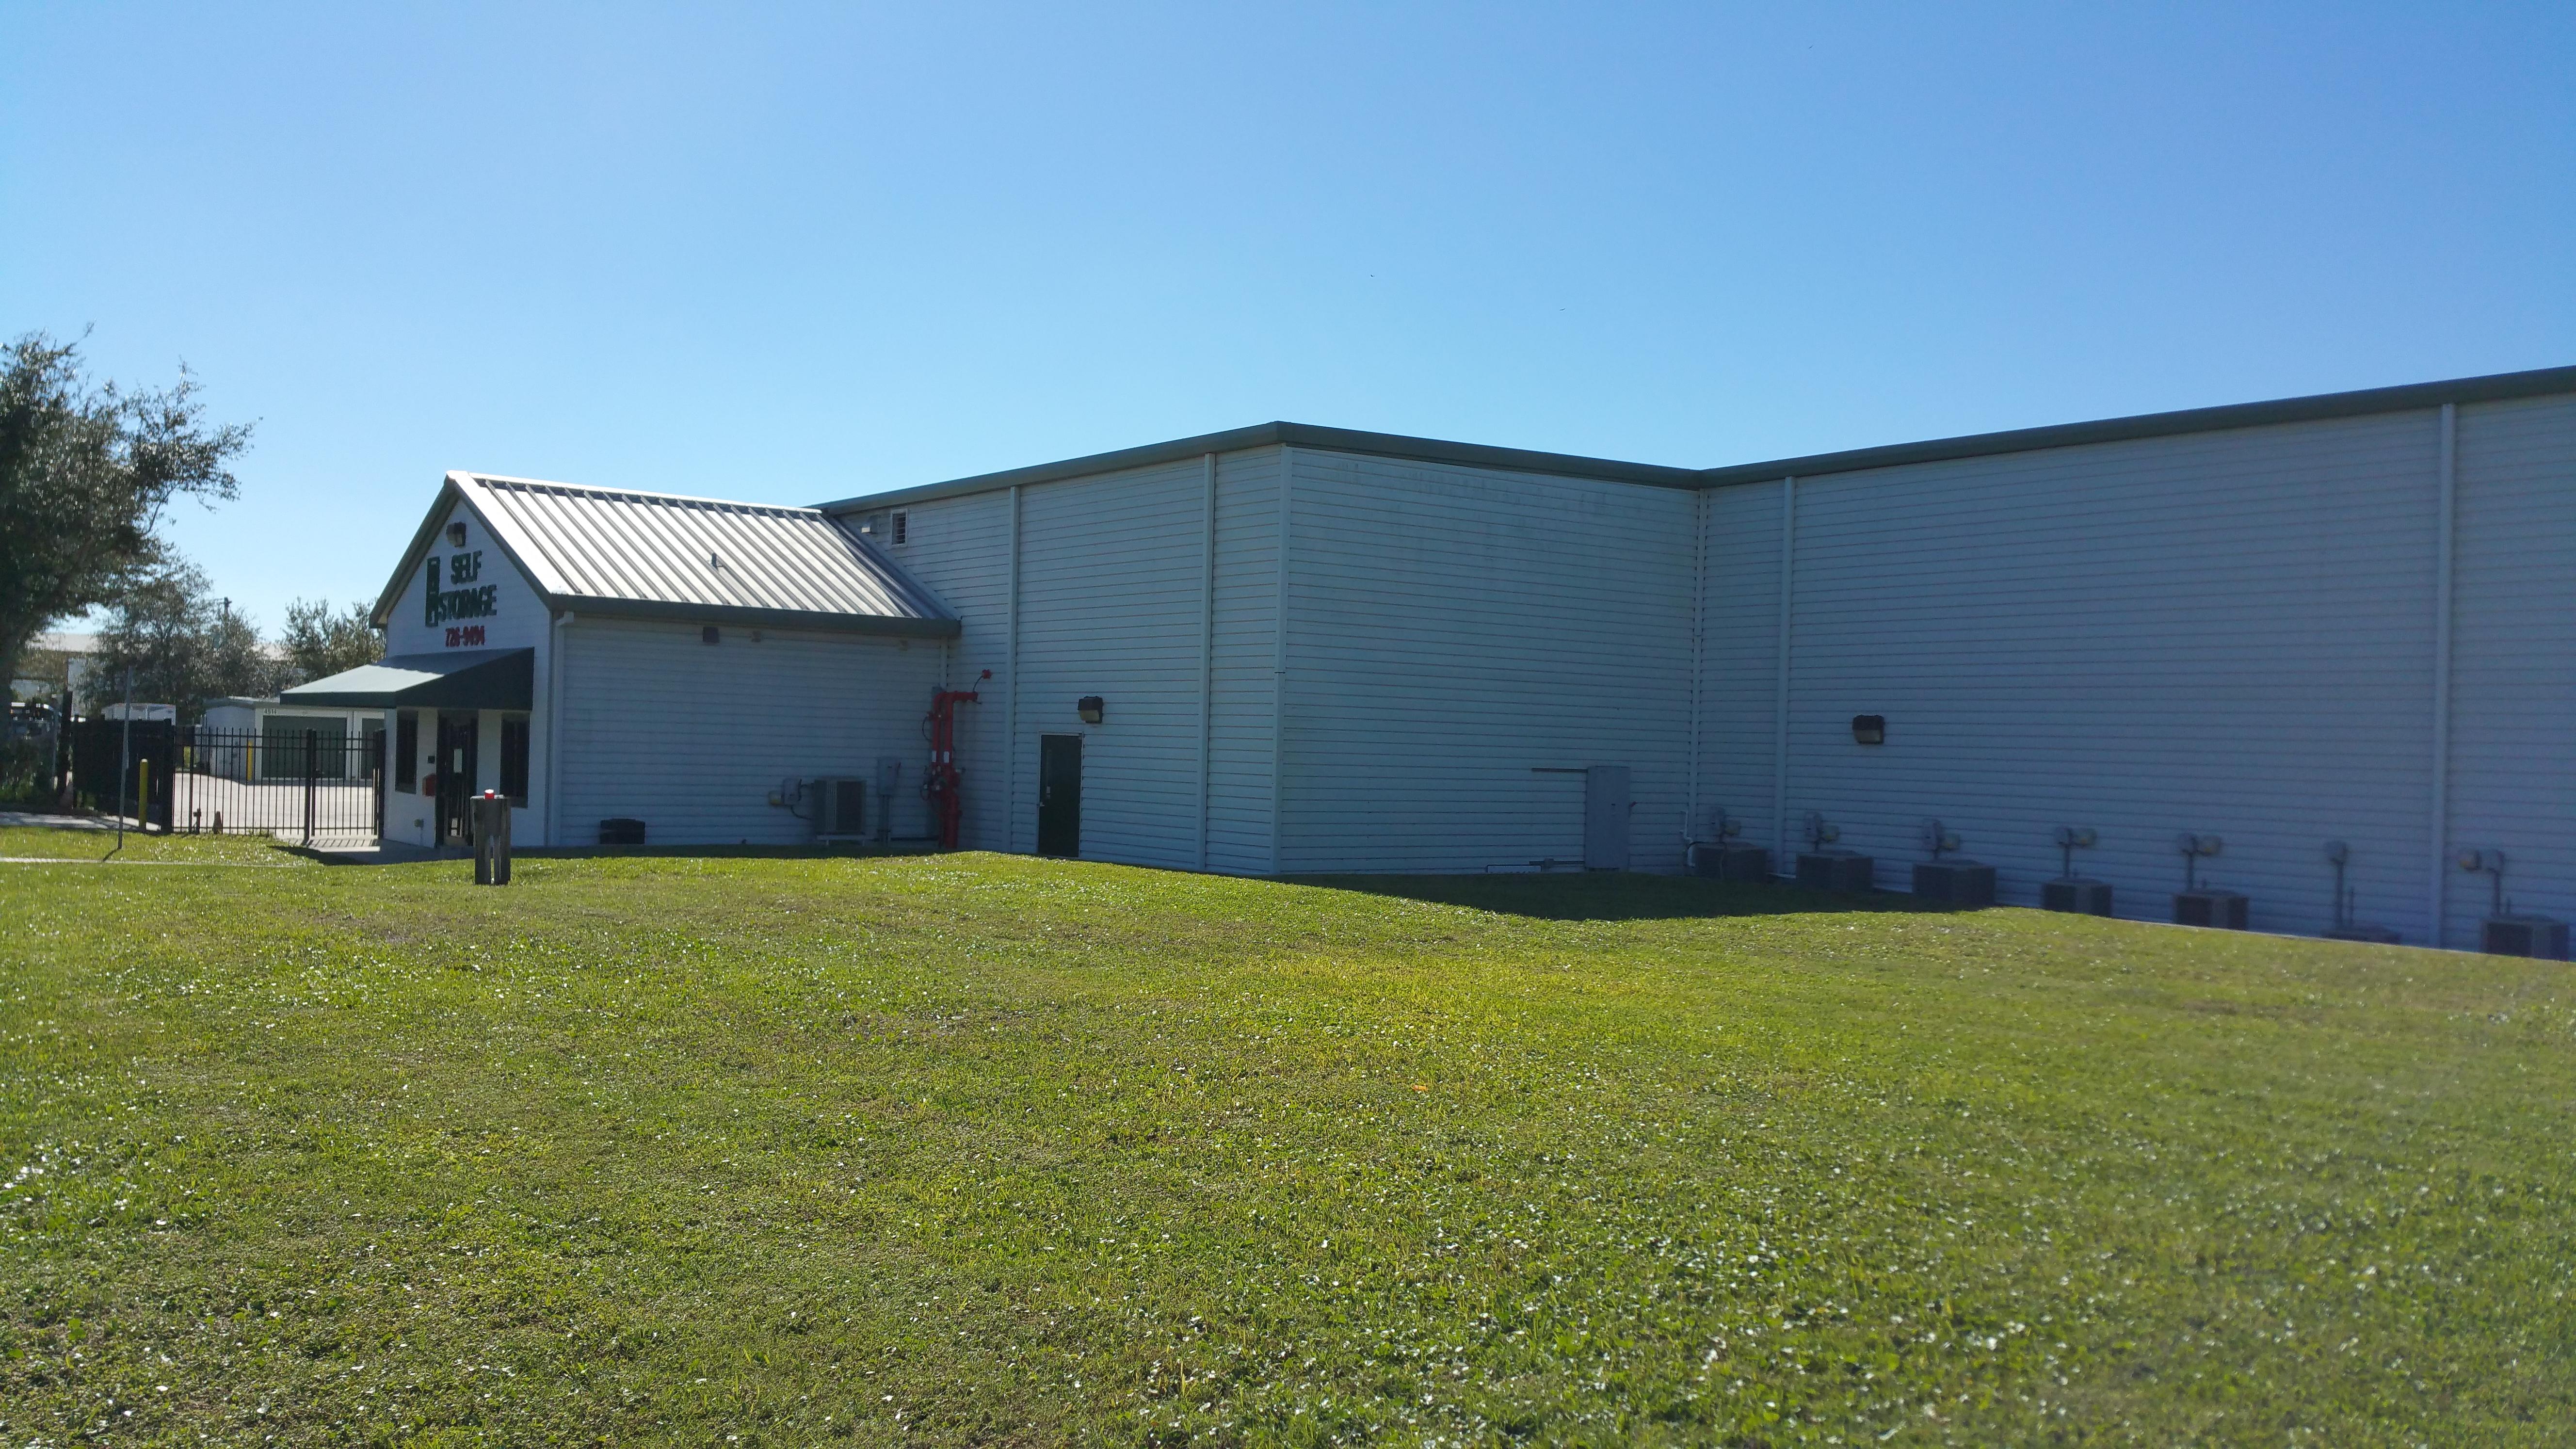 bp self storage building in Palm Bay, FL